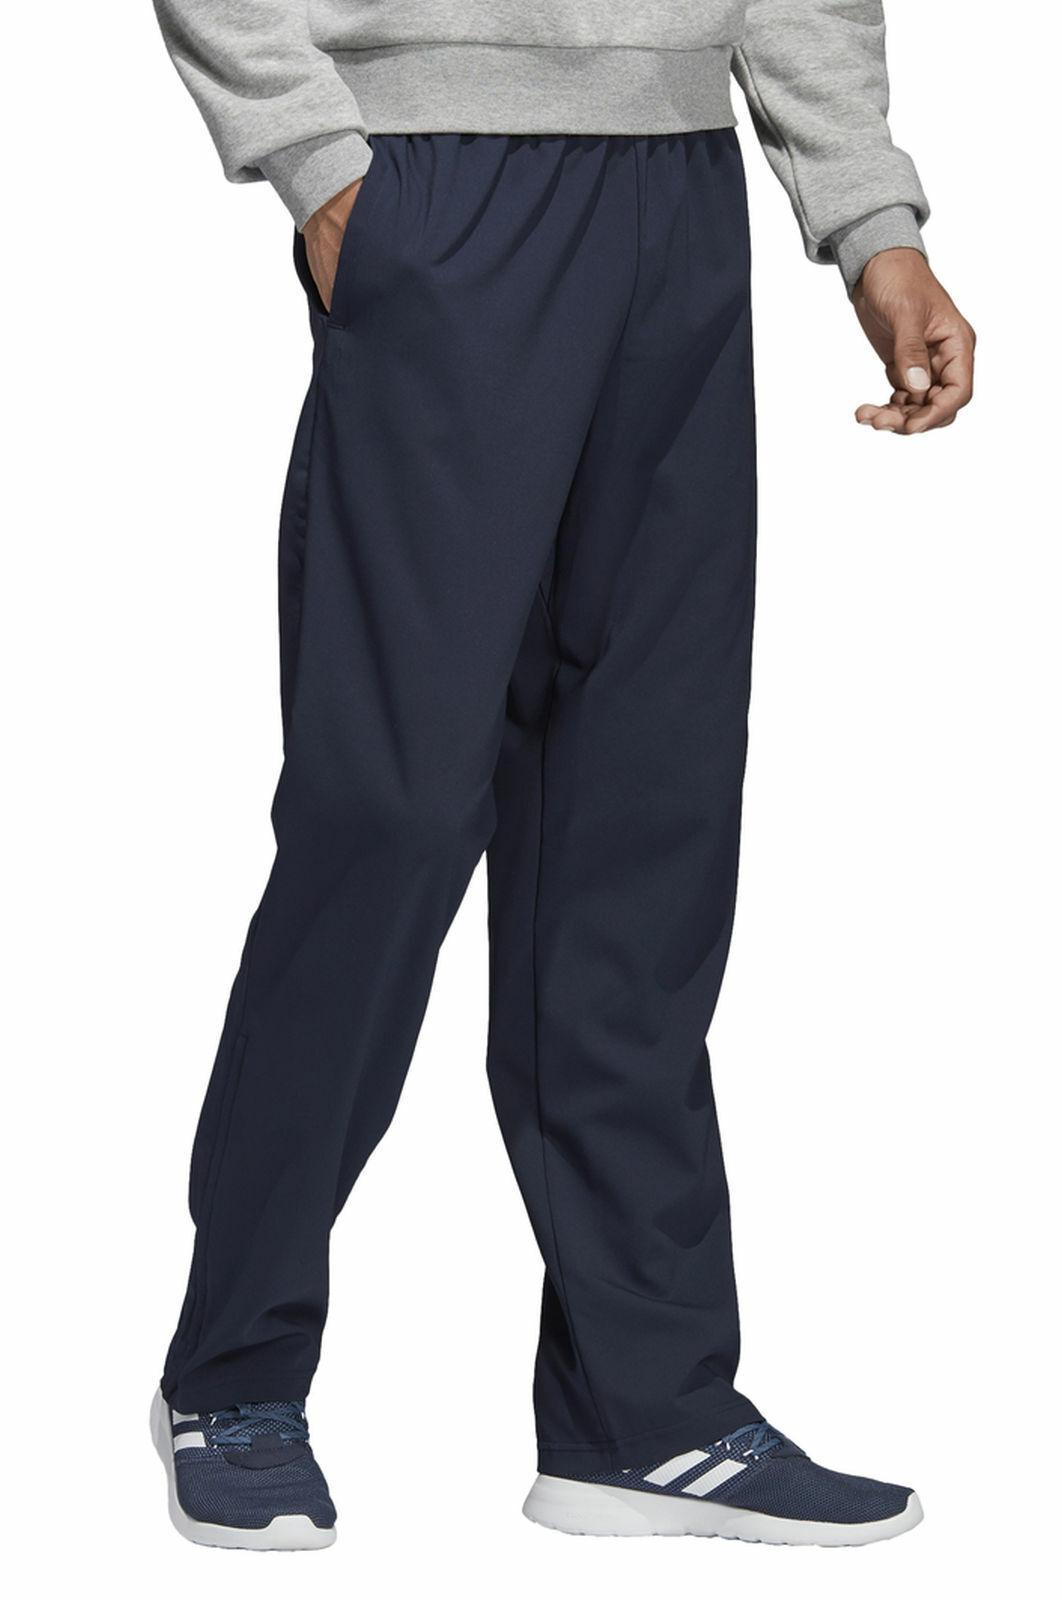 Adidas Hose Herren Blau Vergleich Test +++ Adidas Hose